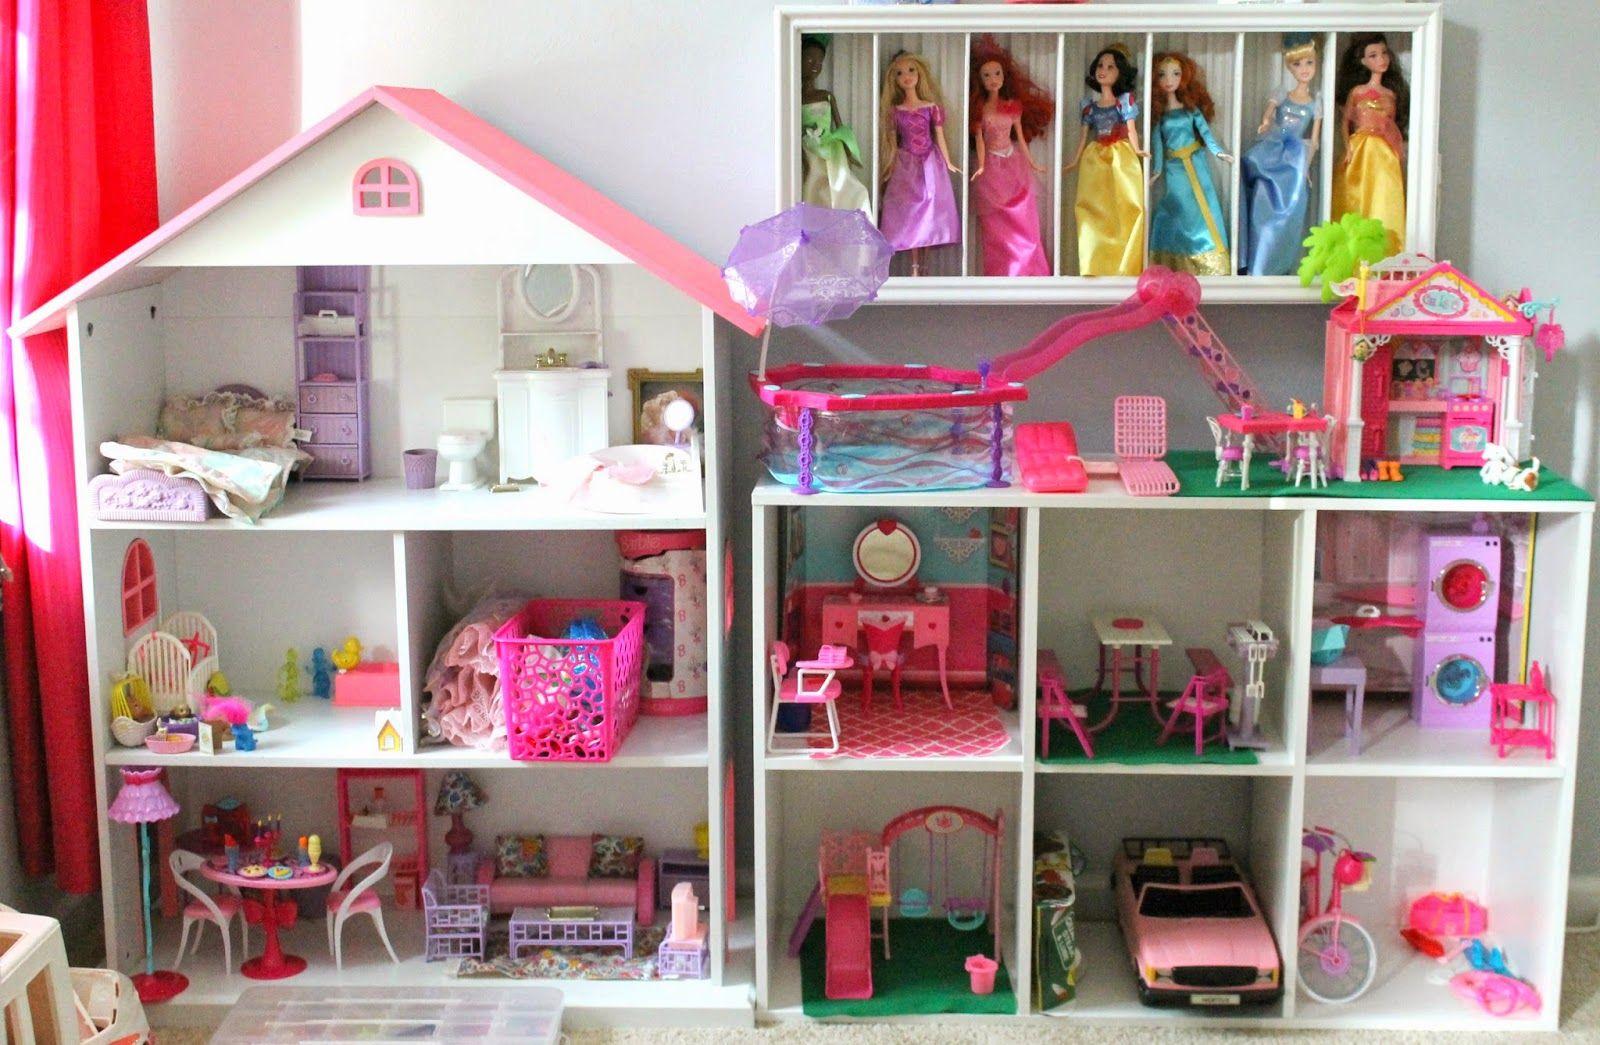 DIY Barbie house using a bookshelf and cube shelf from